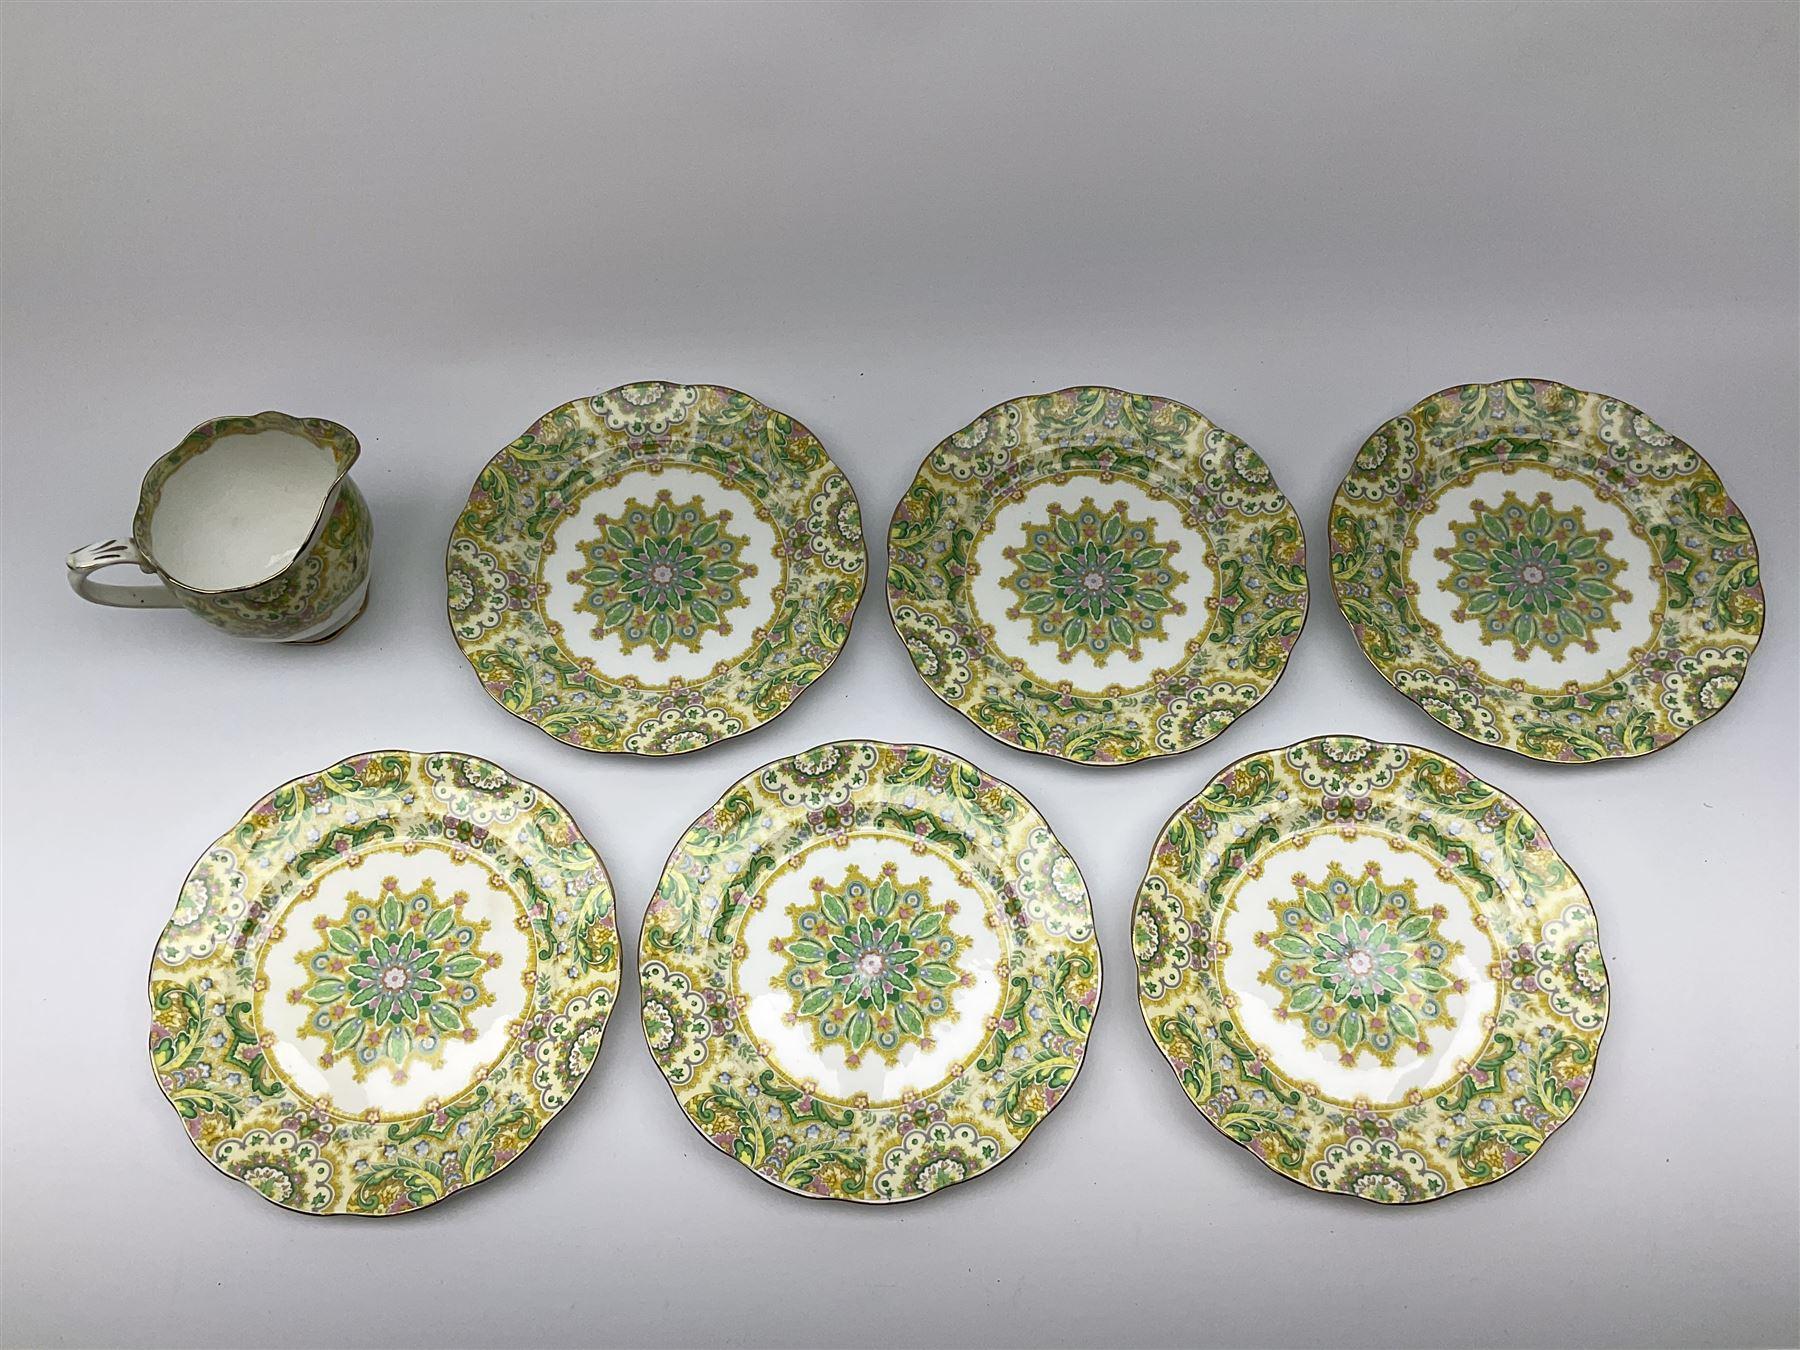 Royal Albert 'Paisley Shawl' pattern part tea set - Image 8 of 12